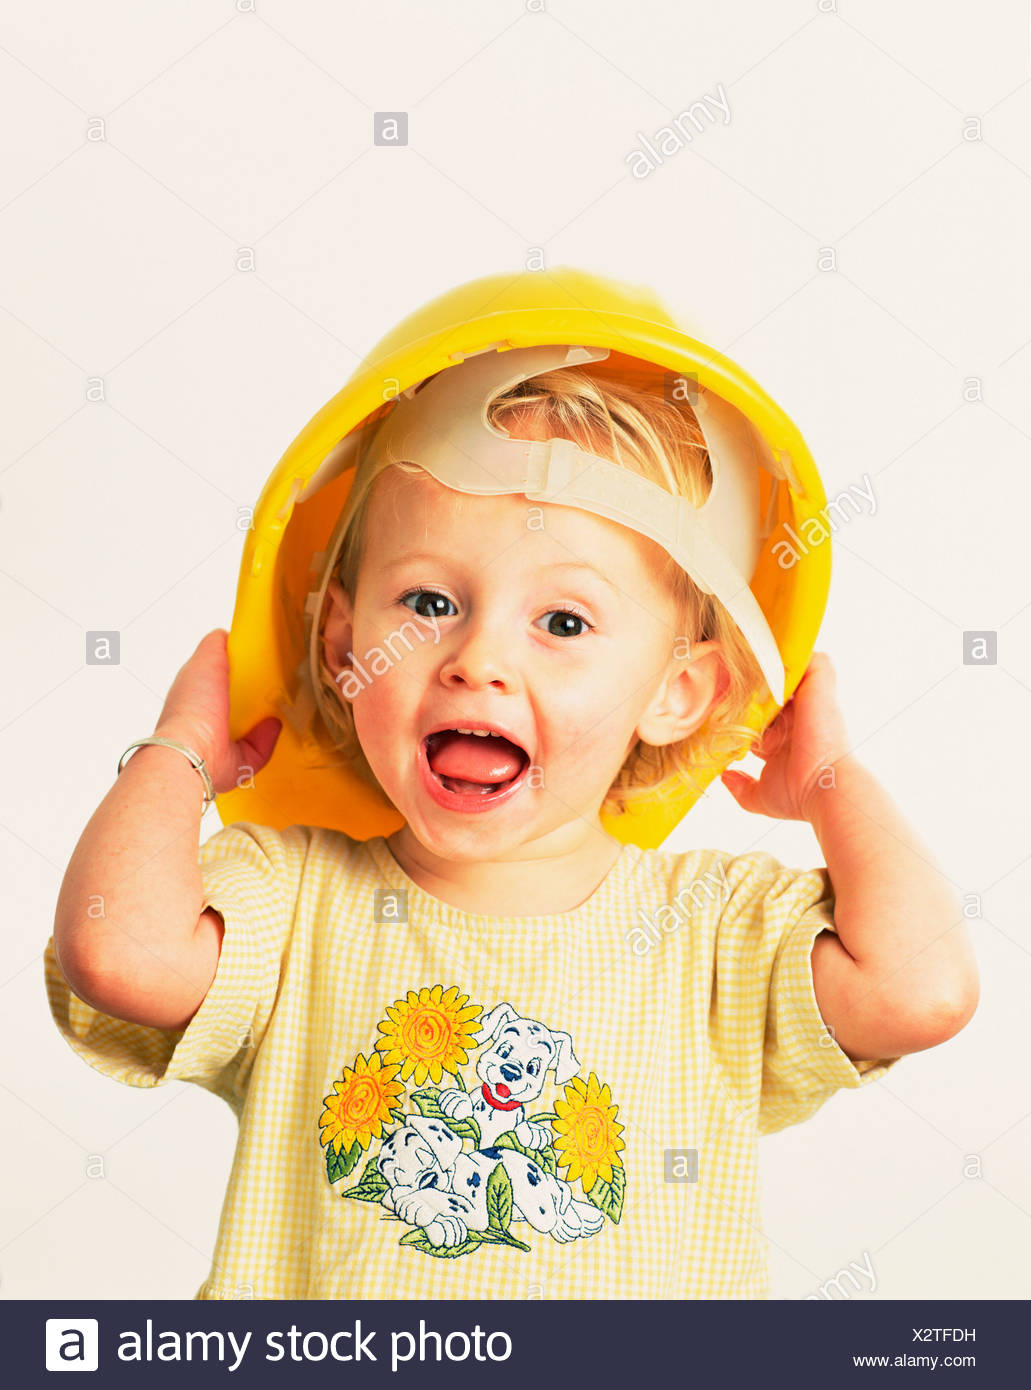 735fbe563 Indoor studio portrait of child trying on yellow hard hat Stock ...